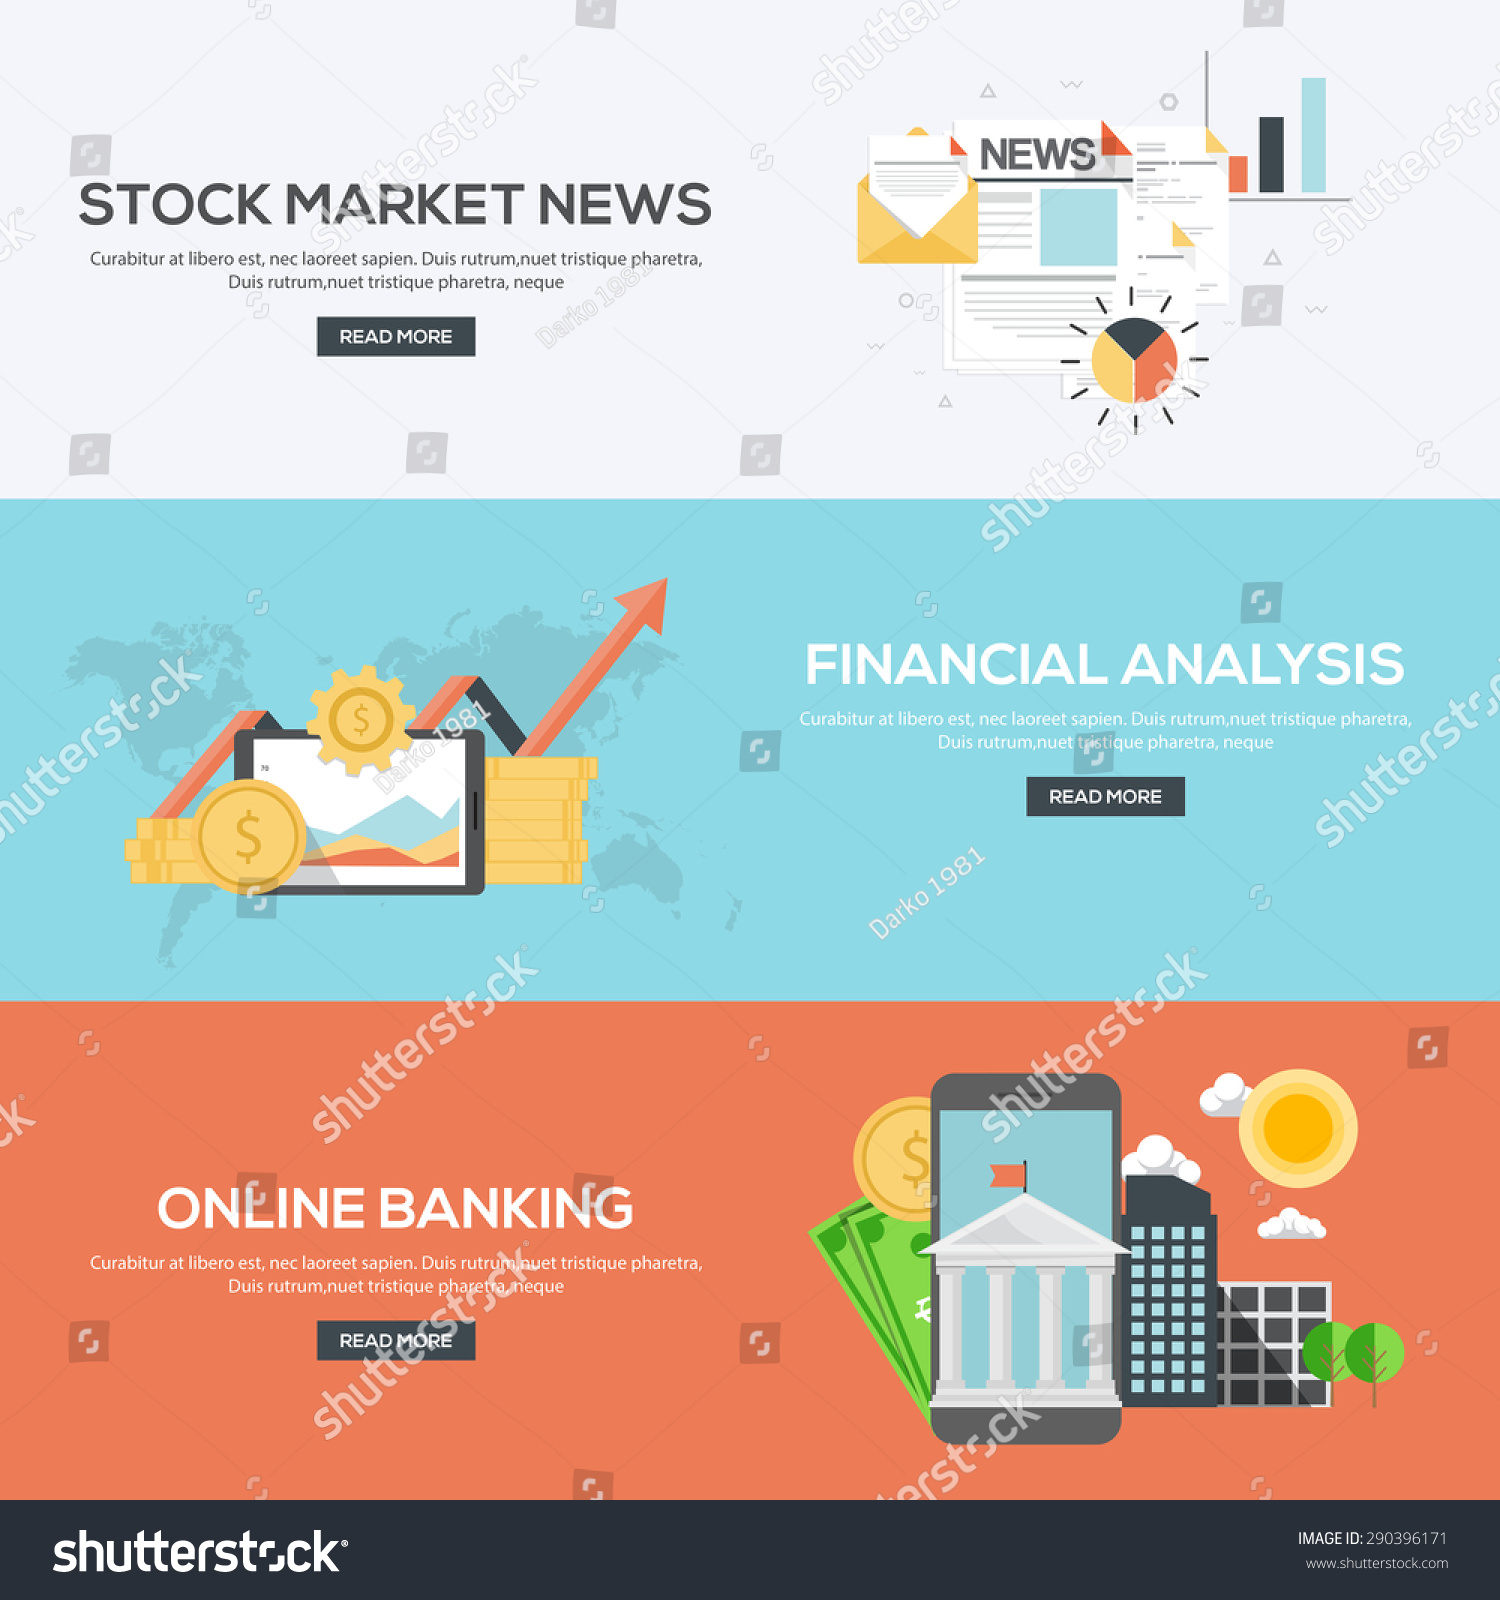 Stock market news websites - drureport343.web.fc2.com